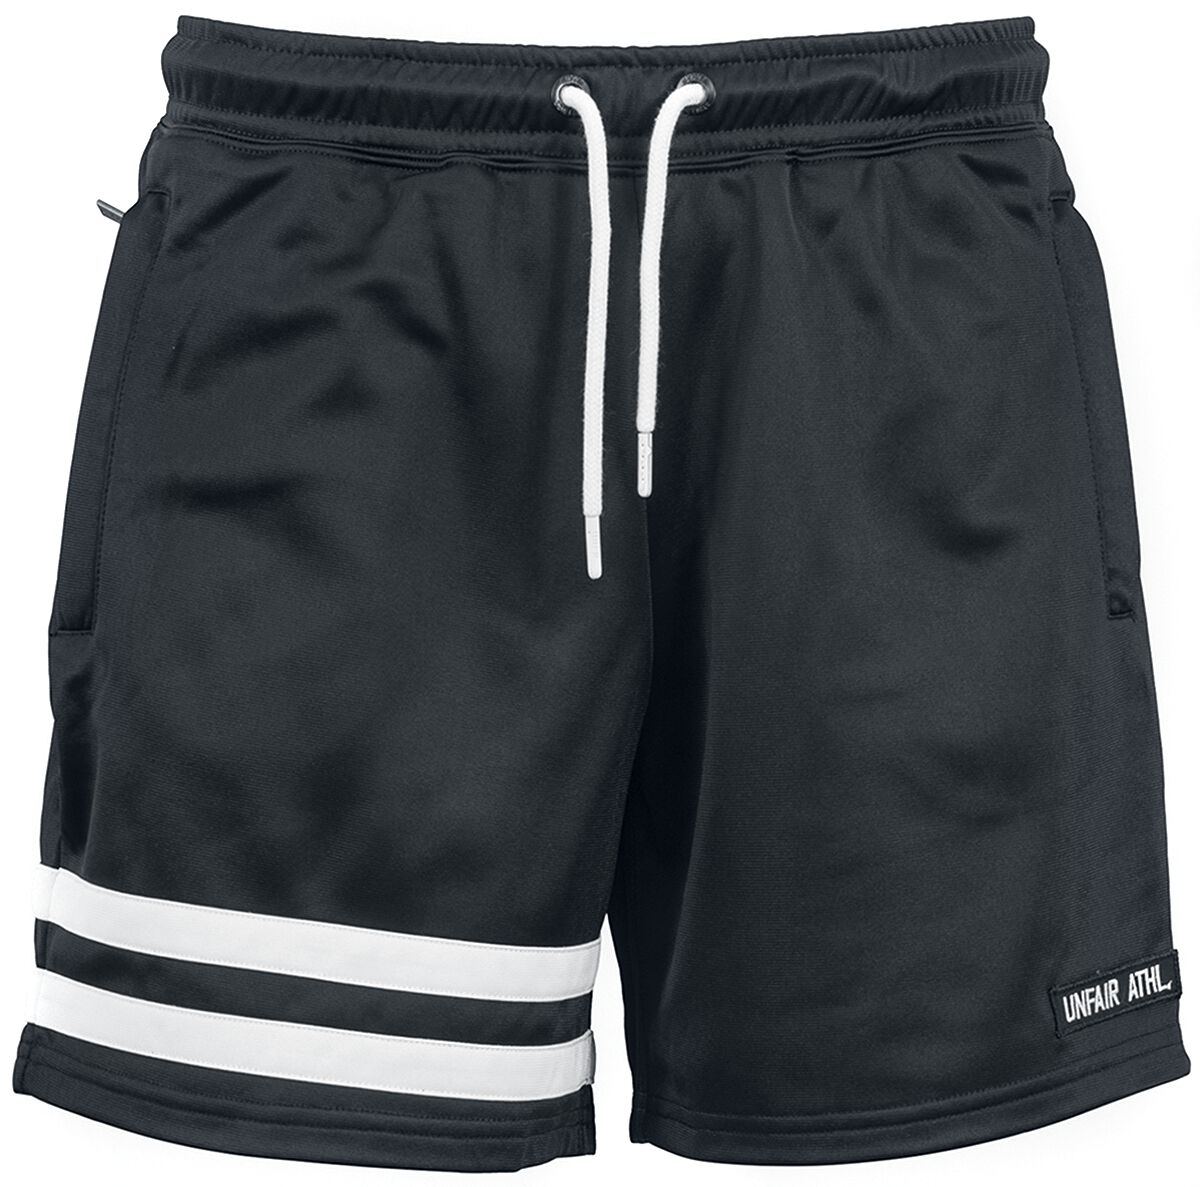 Unfair Athletics DMWU Athletic Shorts Short schwarz UNFR18-024